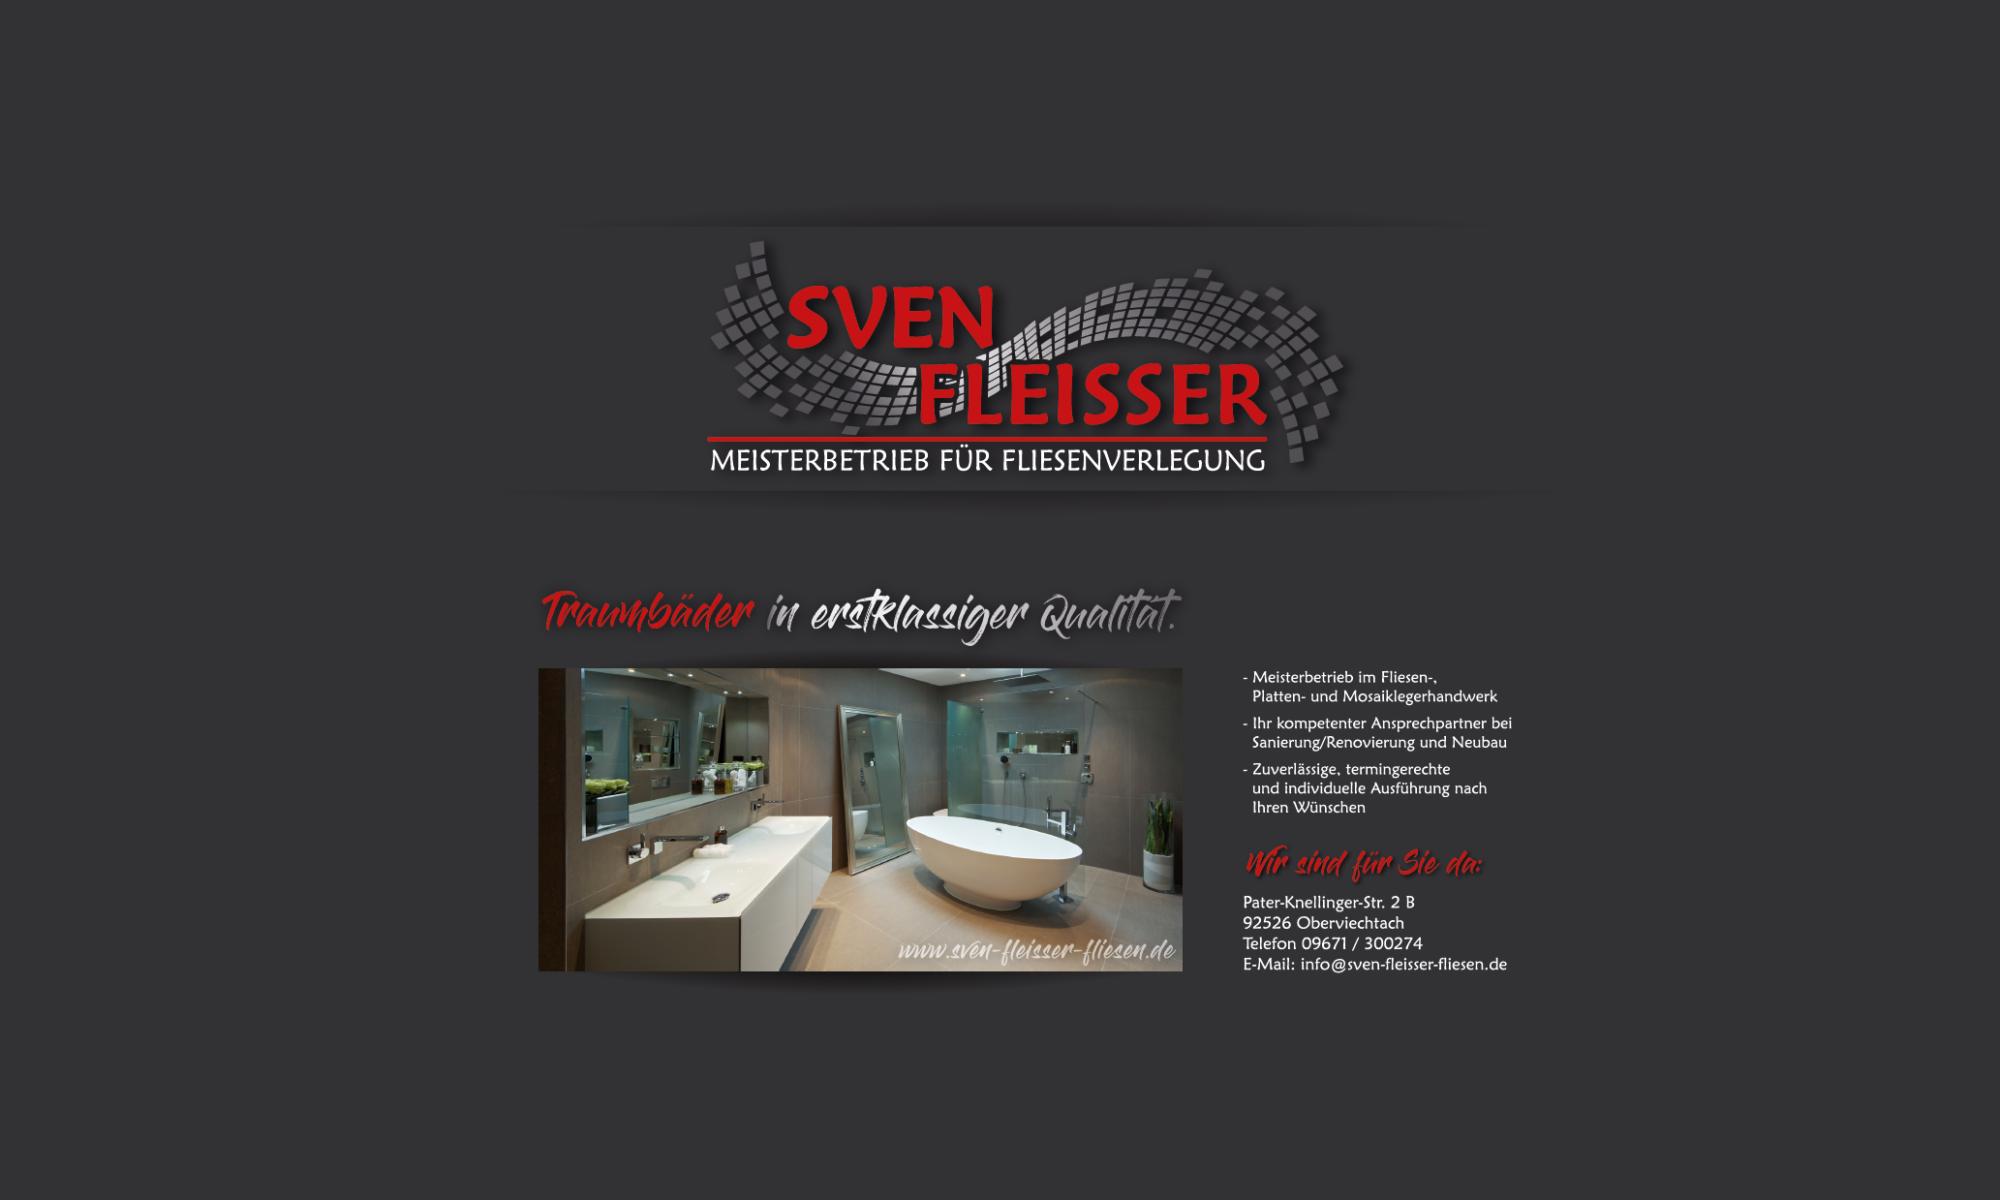 Sven Fleißer - www.sven-fleisser-fliesen.de